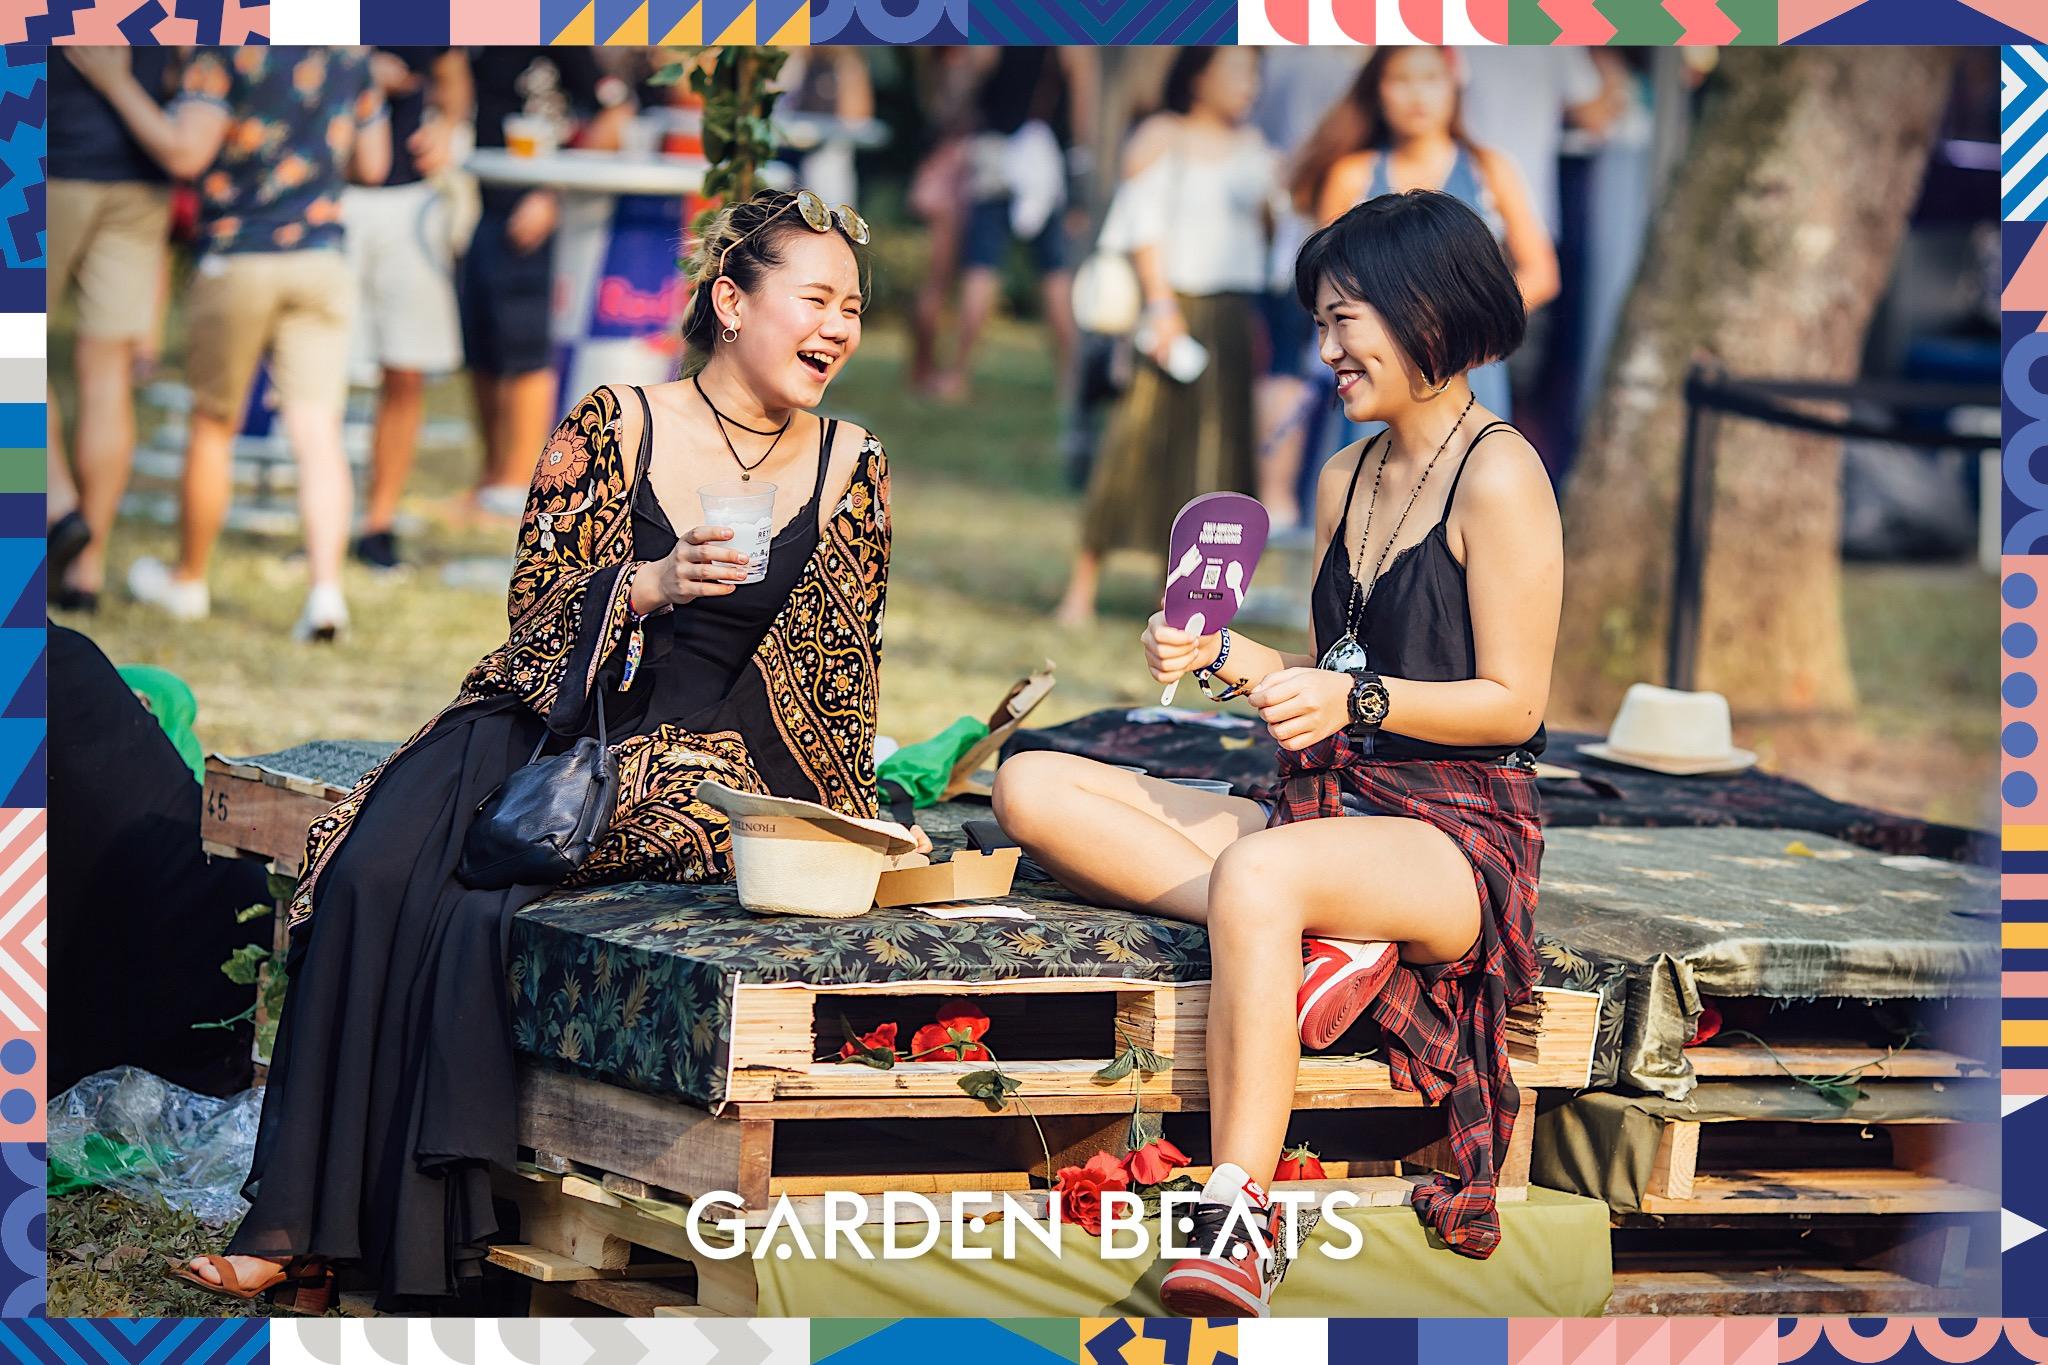 18032017_GardenBeats_Colossal555_WatermarkedGB.jpg